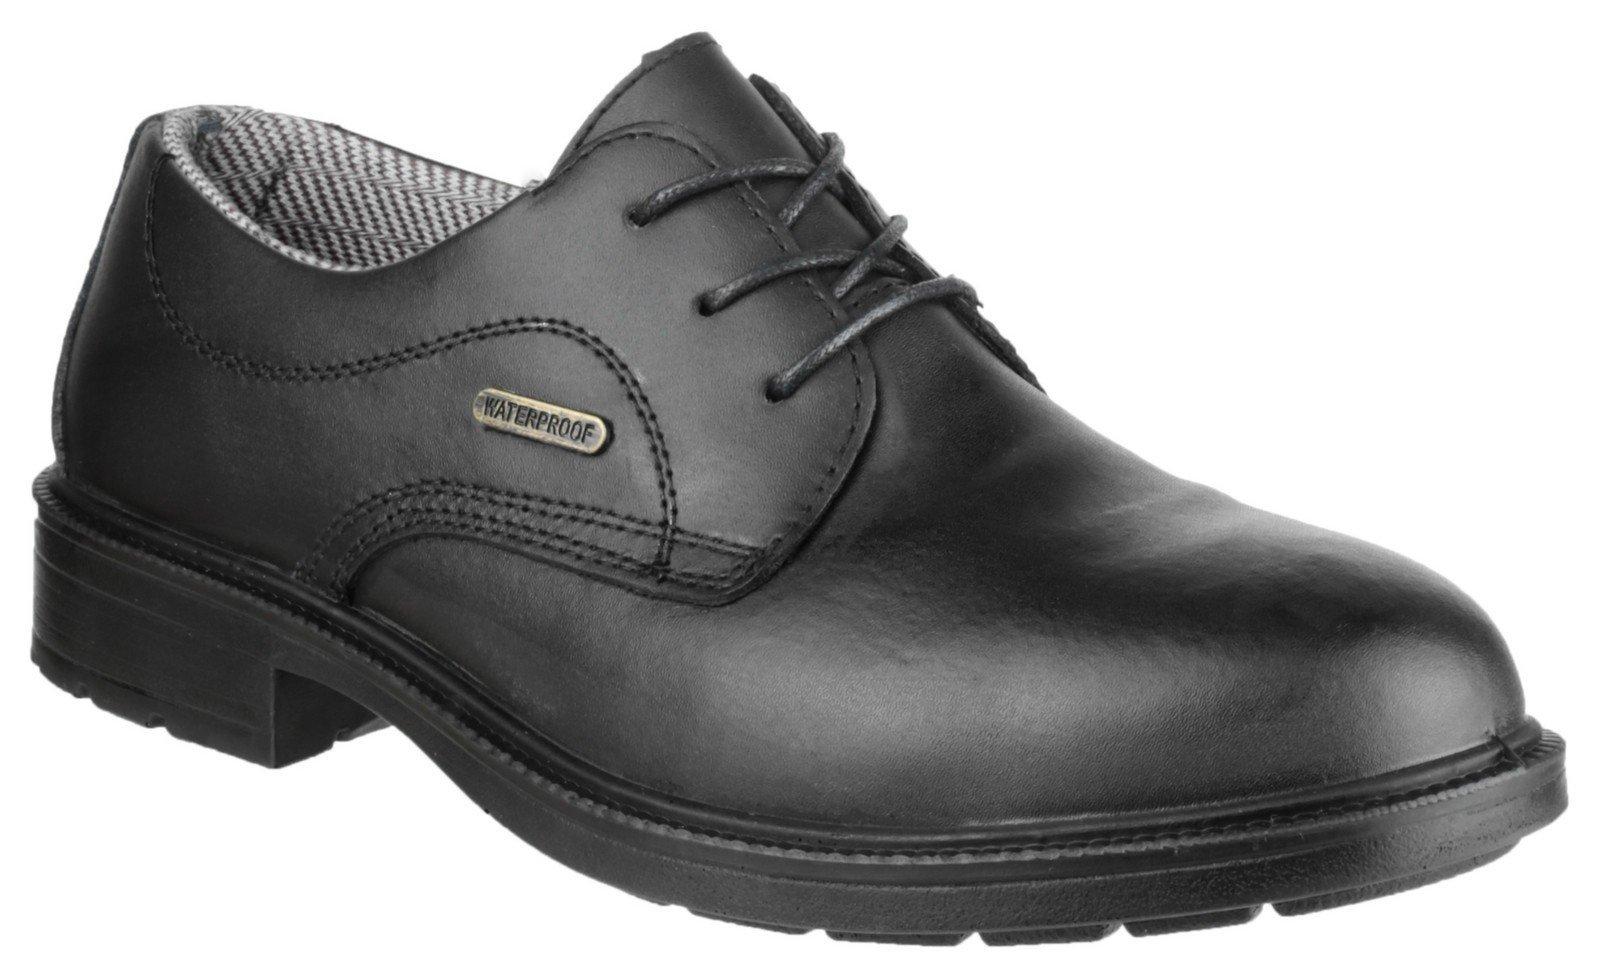 Amblers Unisex Safety Waterproof Lace up Gibson Shoe Black 21518 - Black 6